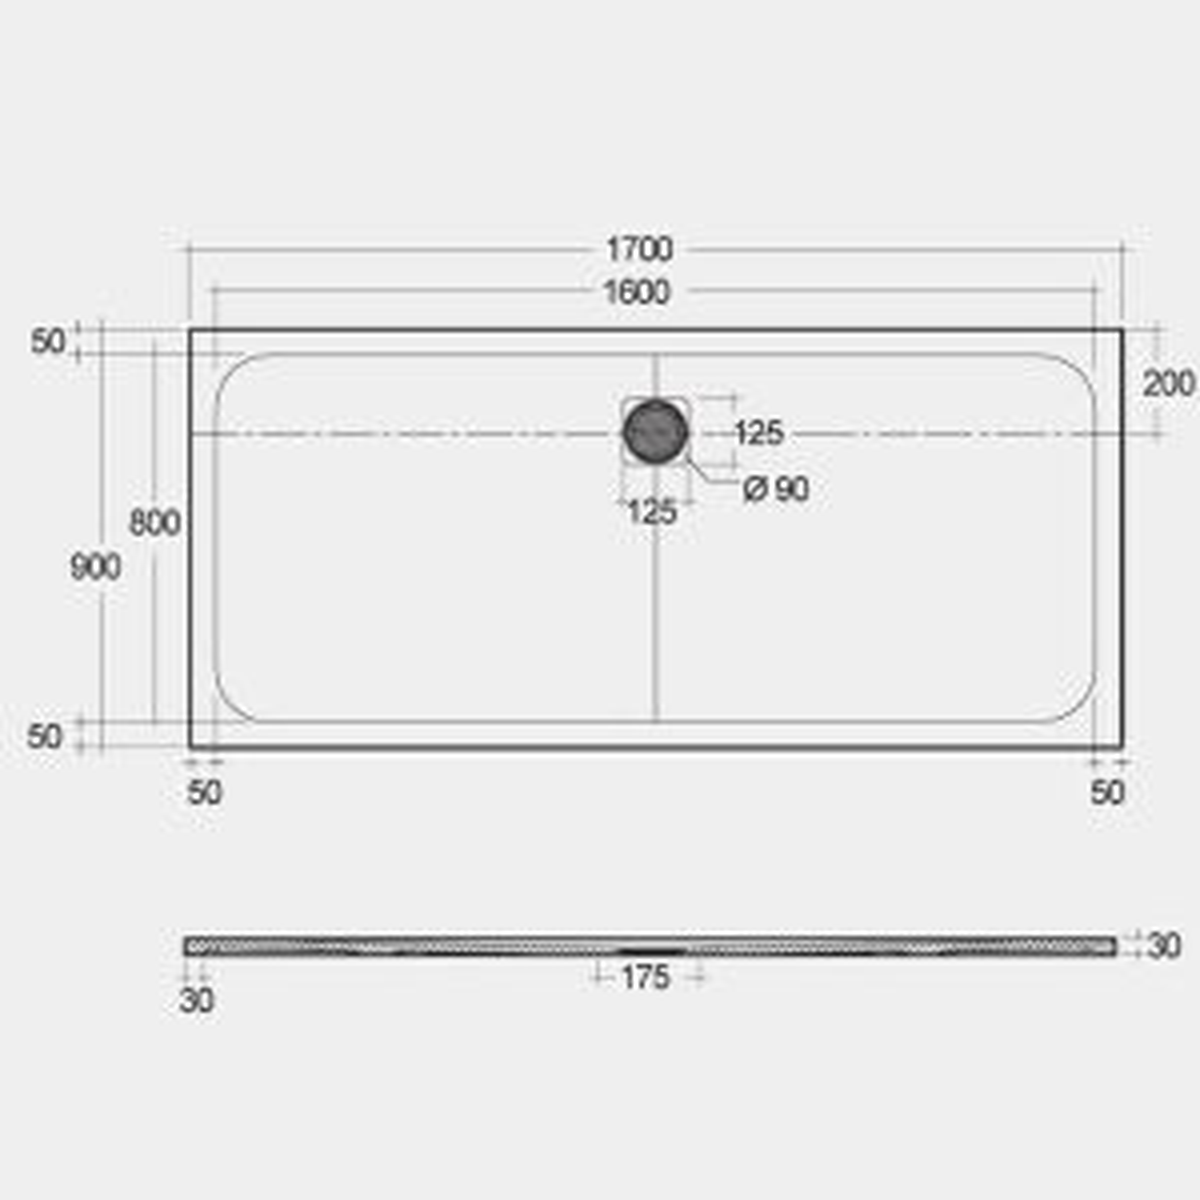 RAK Feeling Cappuccino Rectangular Shower Tray 1700 x 900mm Measurements